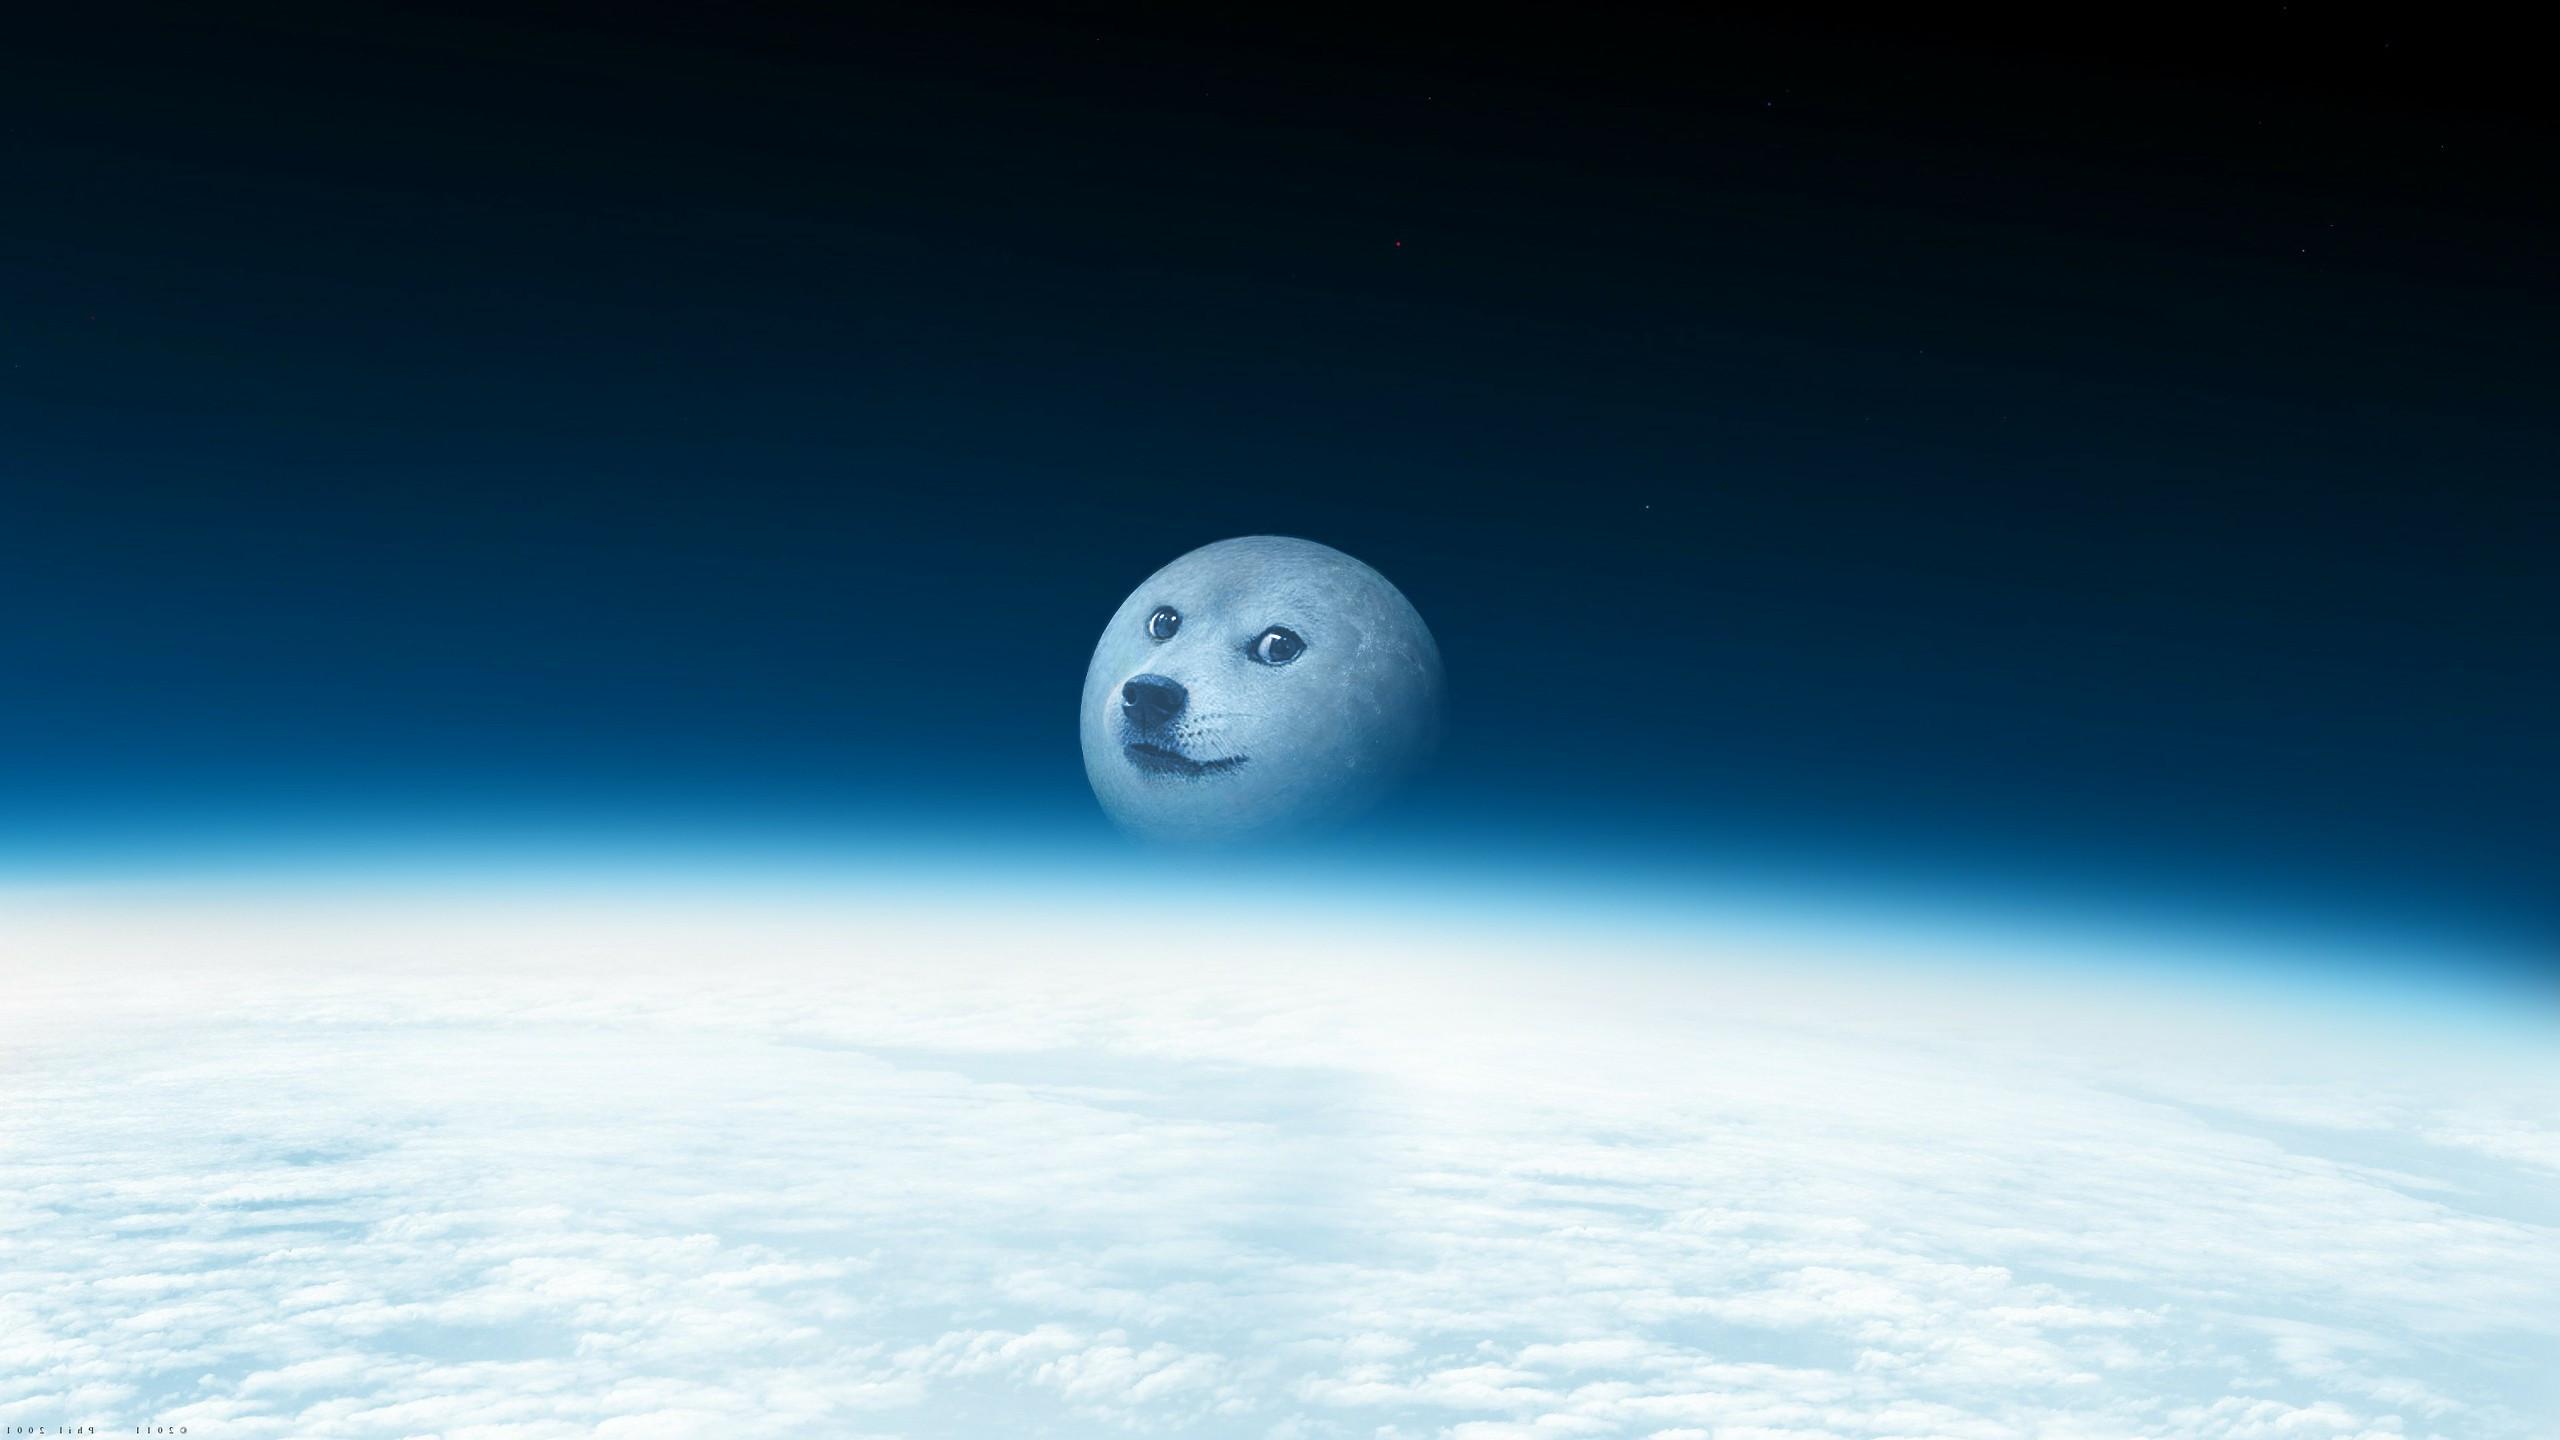 Doge Moon version w6 2560×1440